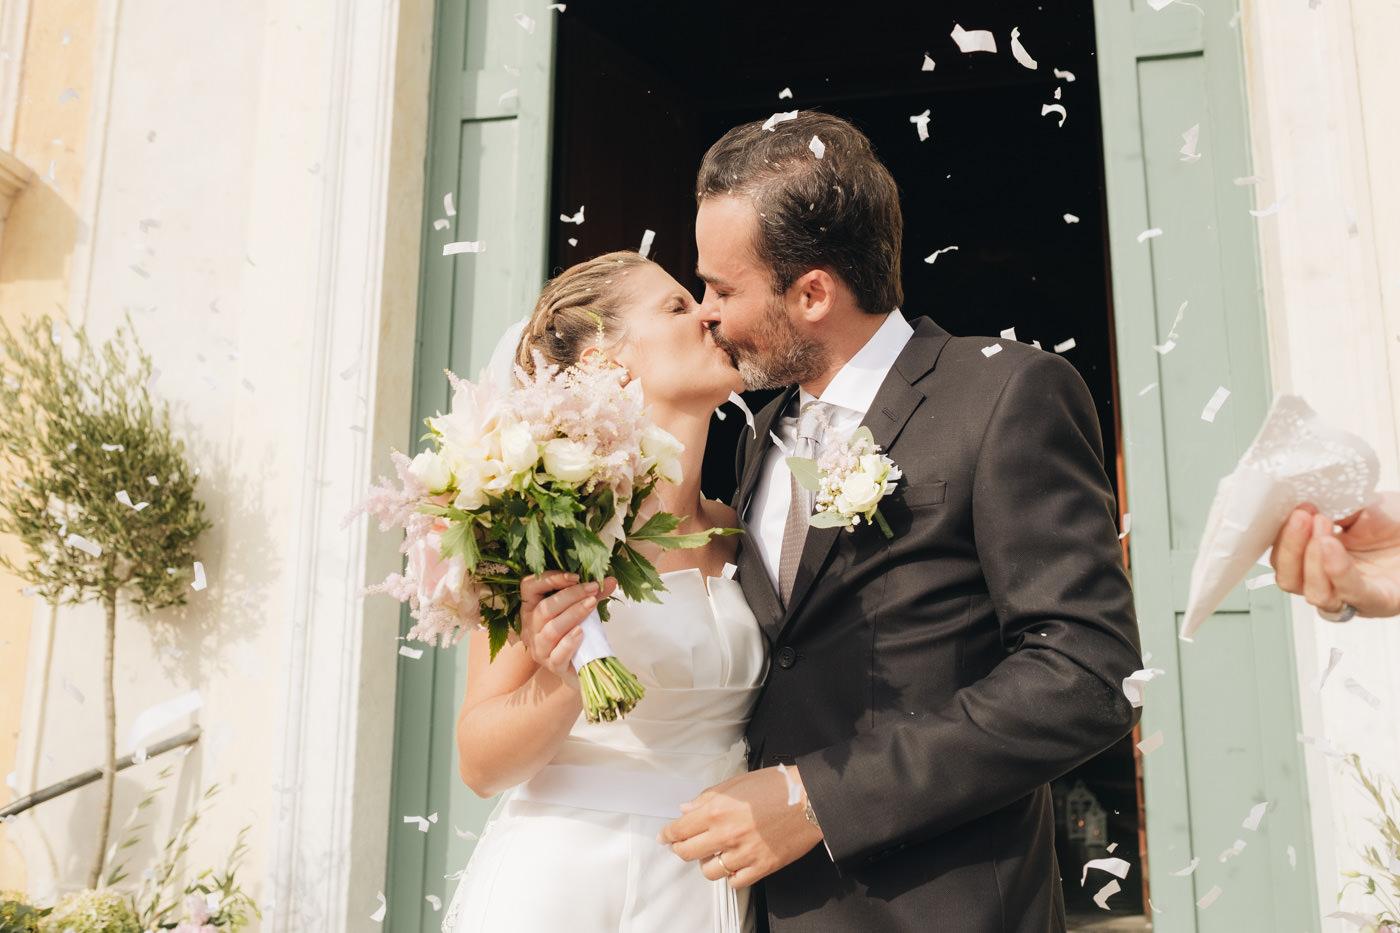 matrimoni_all_italiana_fotografo_matrimonio_cinque_terre-31.jpg